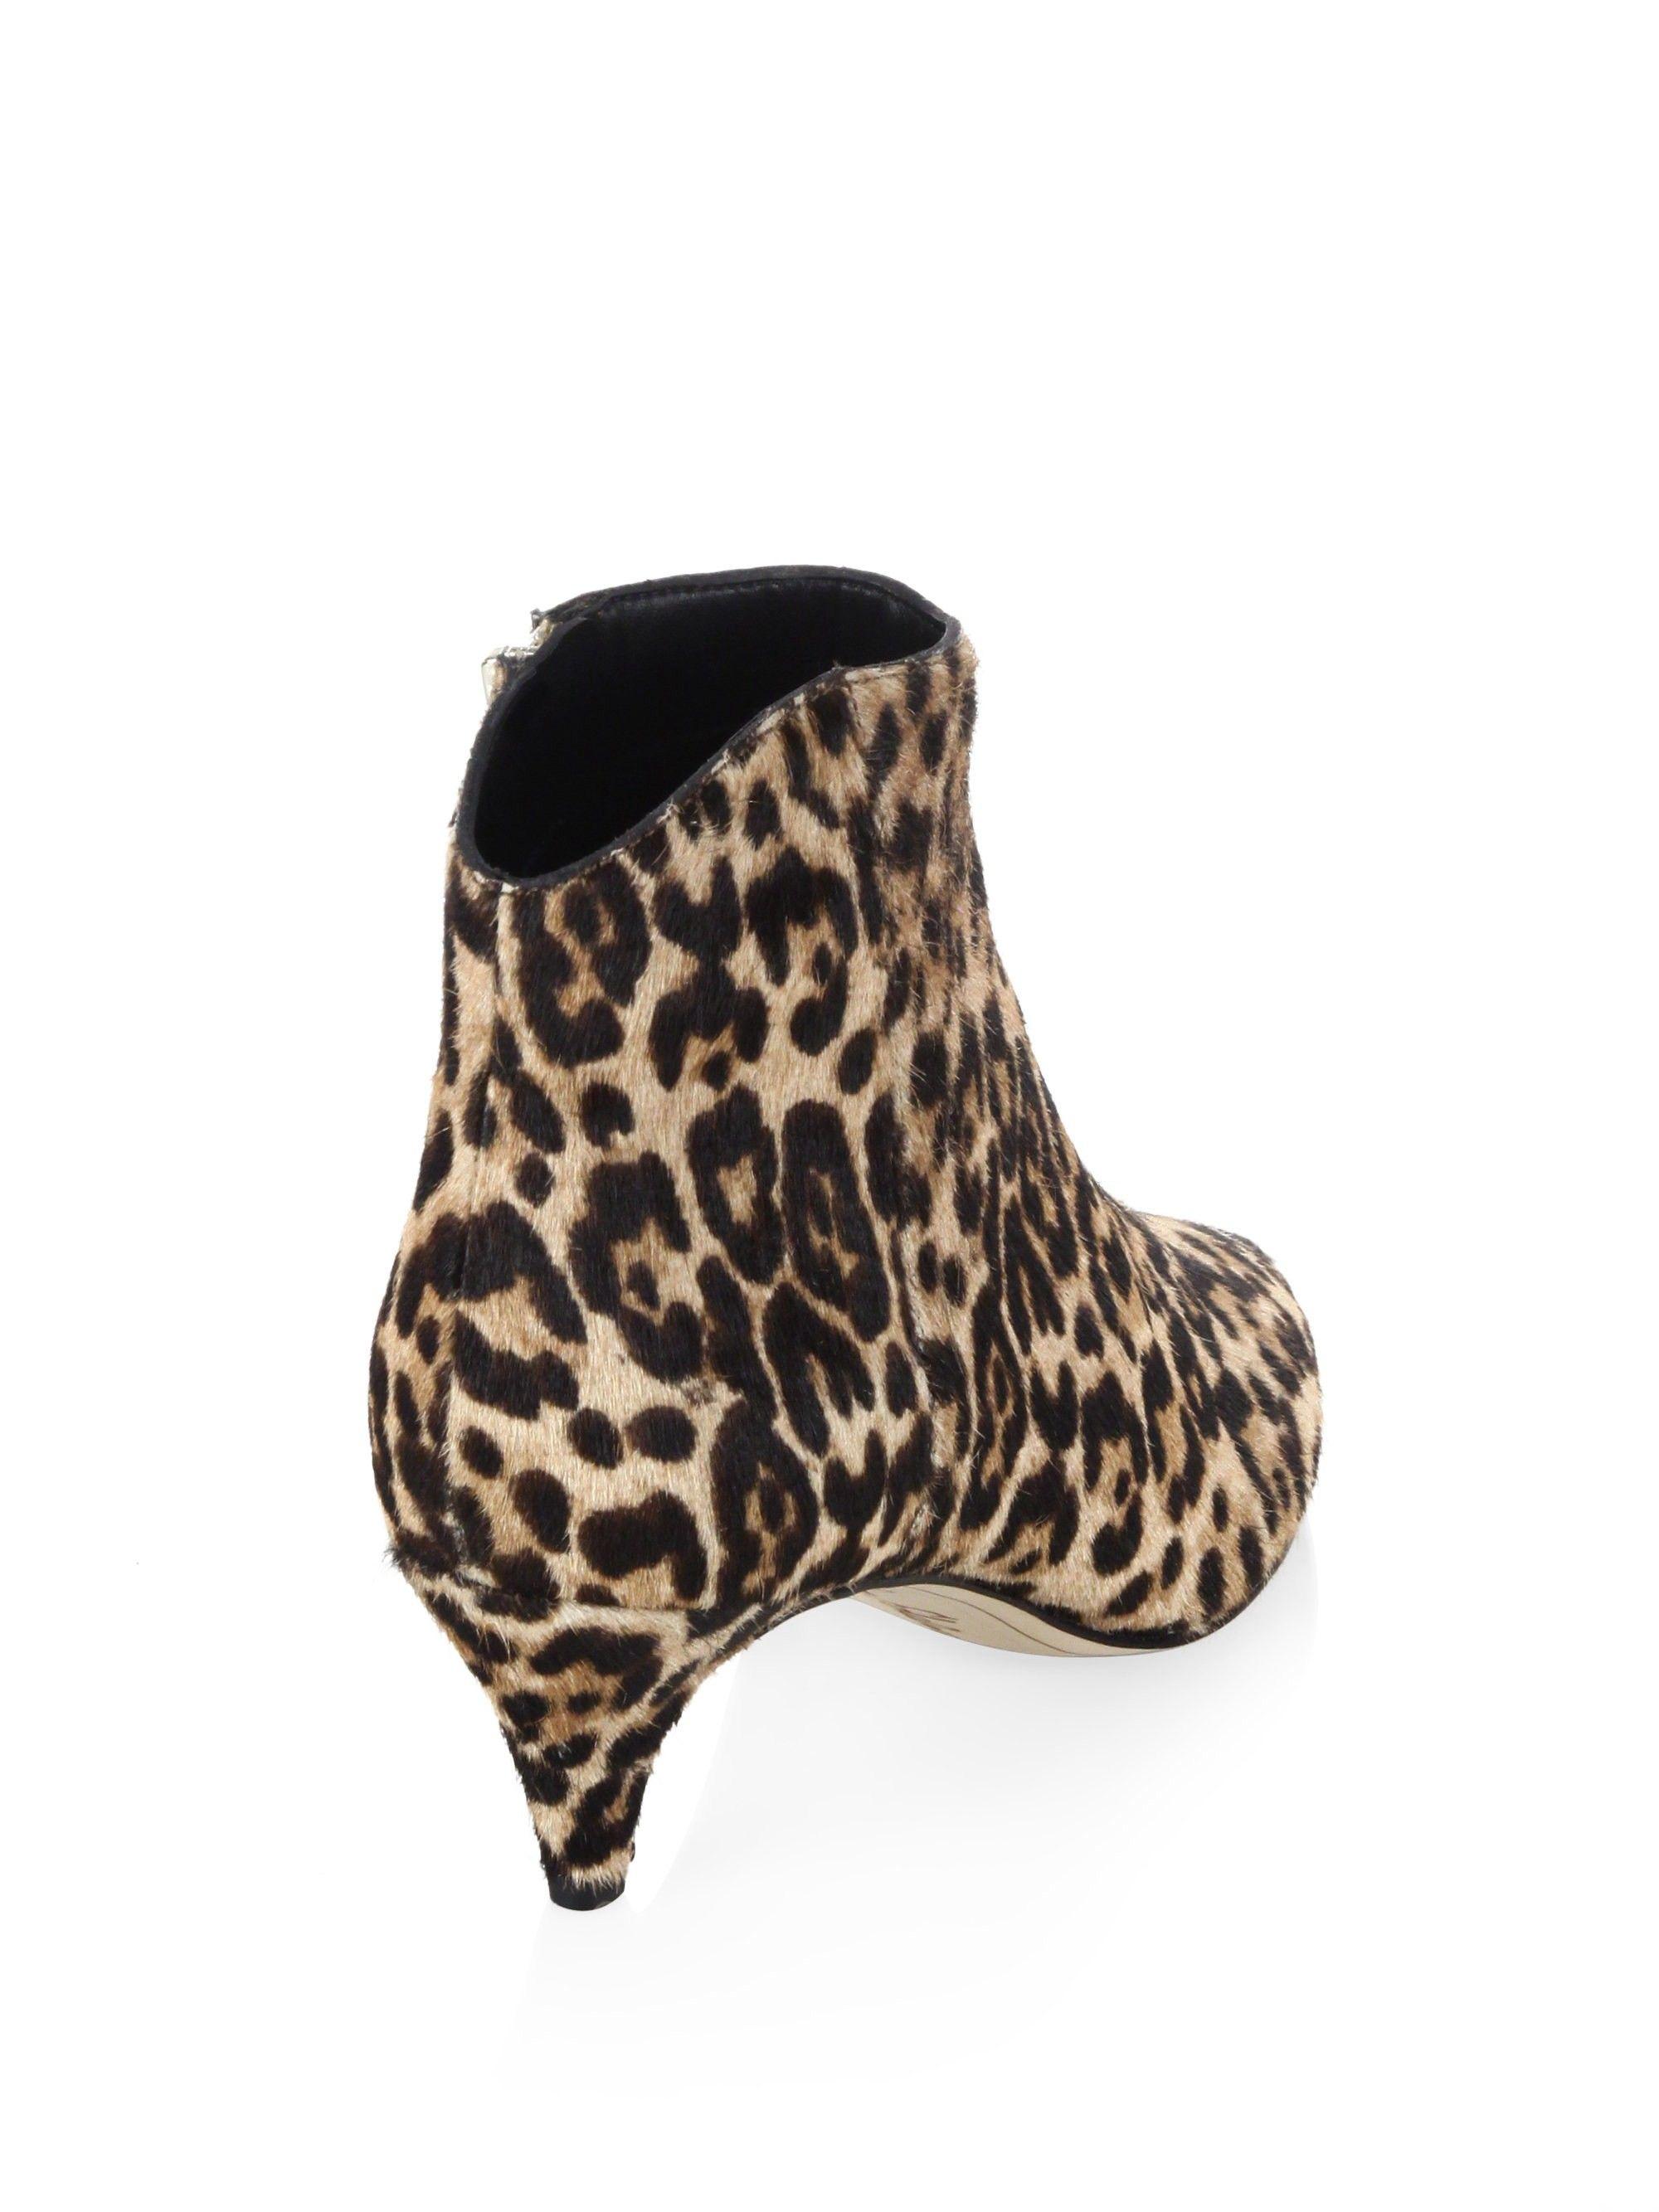 ef94113143dbef Kinzey Leopard Print Calf Hair Kitten Heel Booties by Sam Edelman in ...